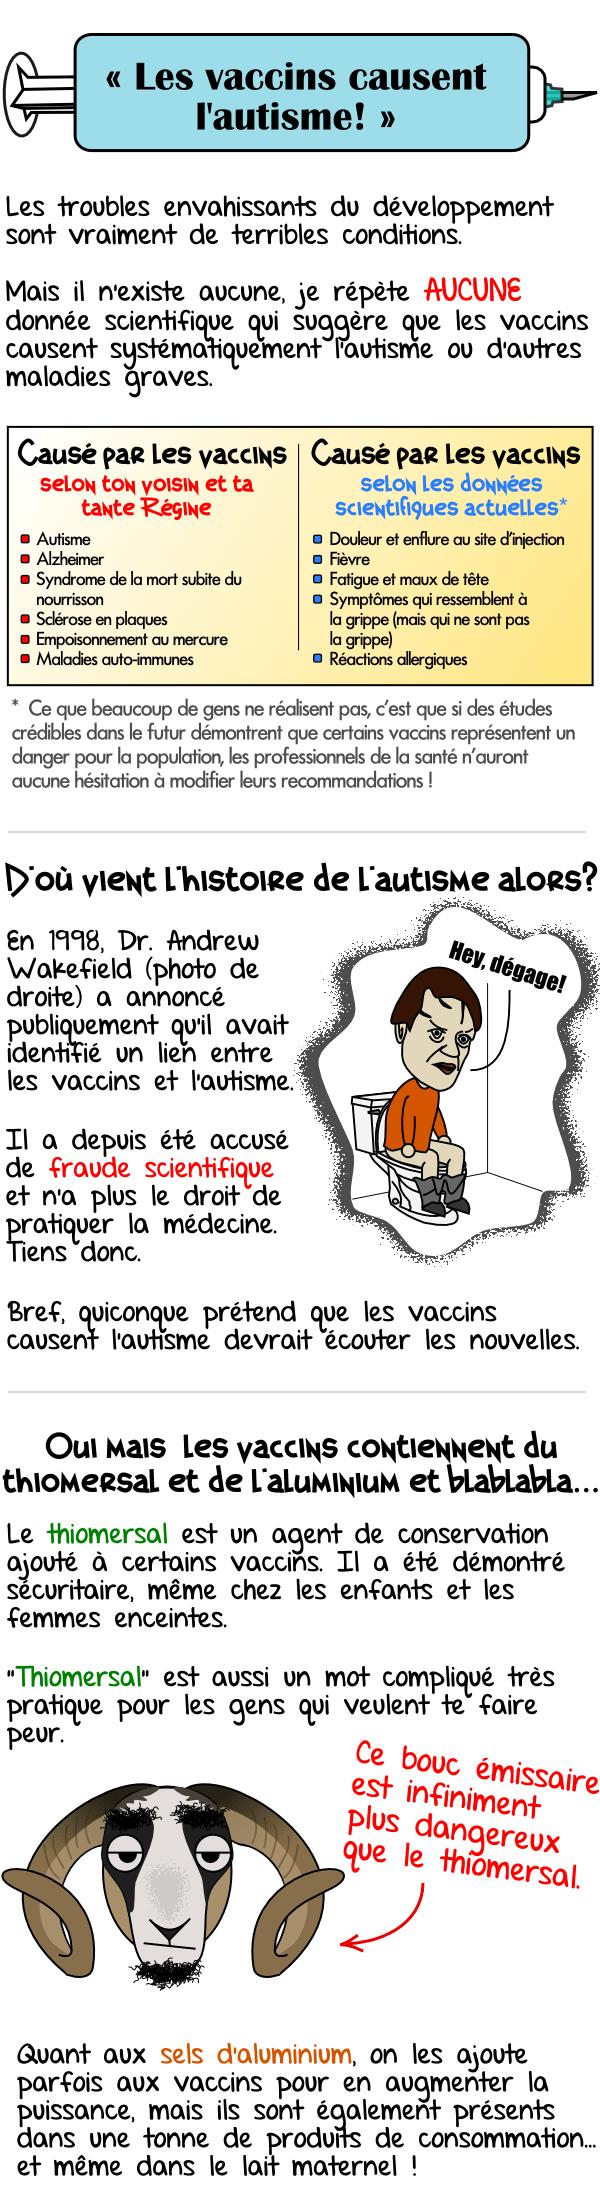 vaccin grippe ingredient